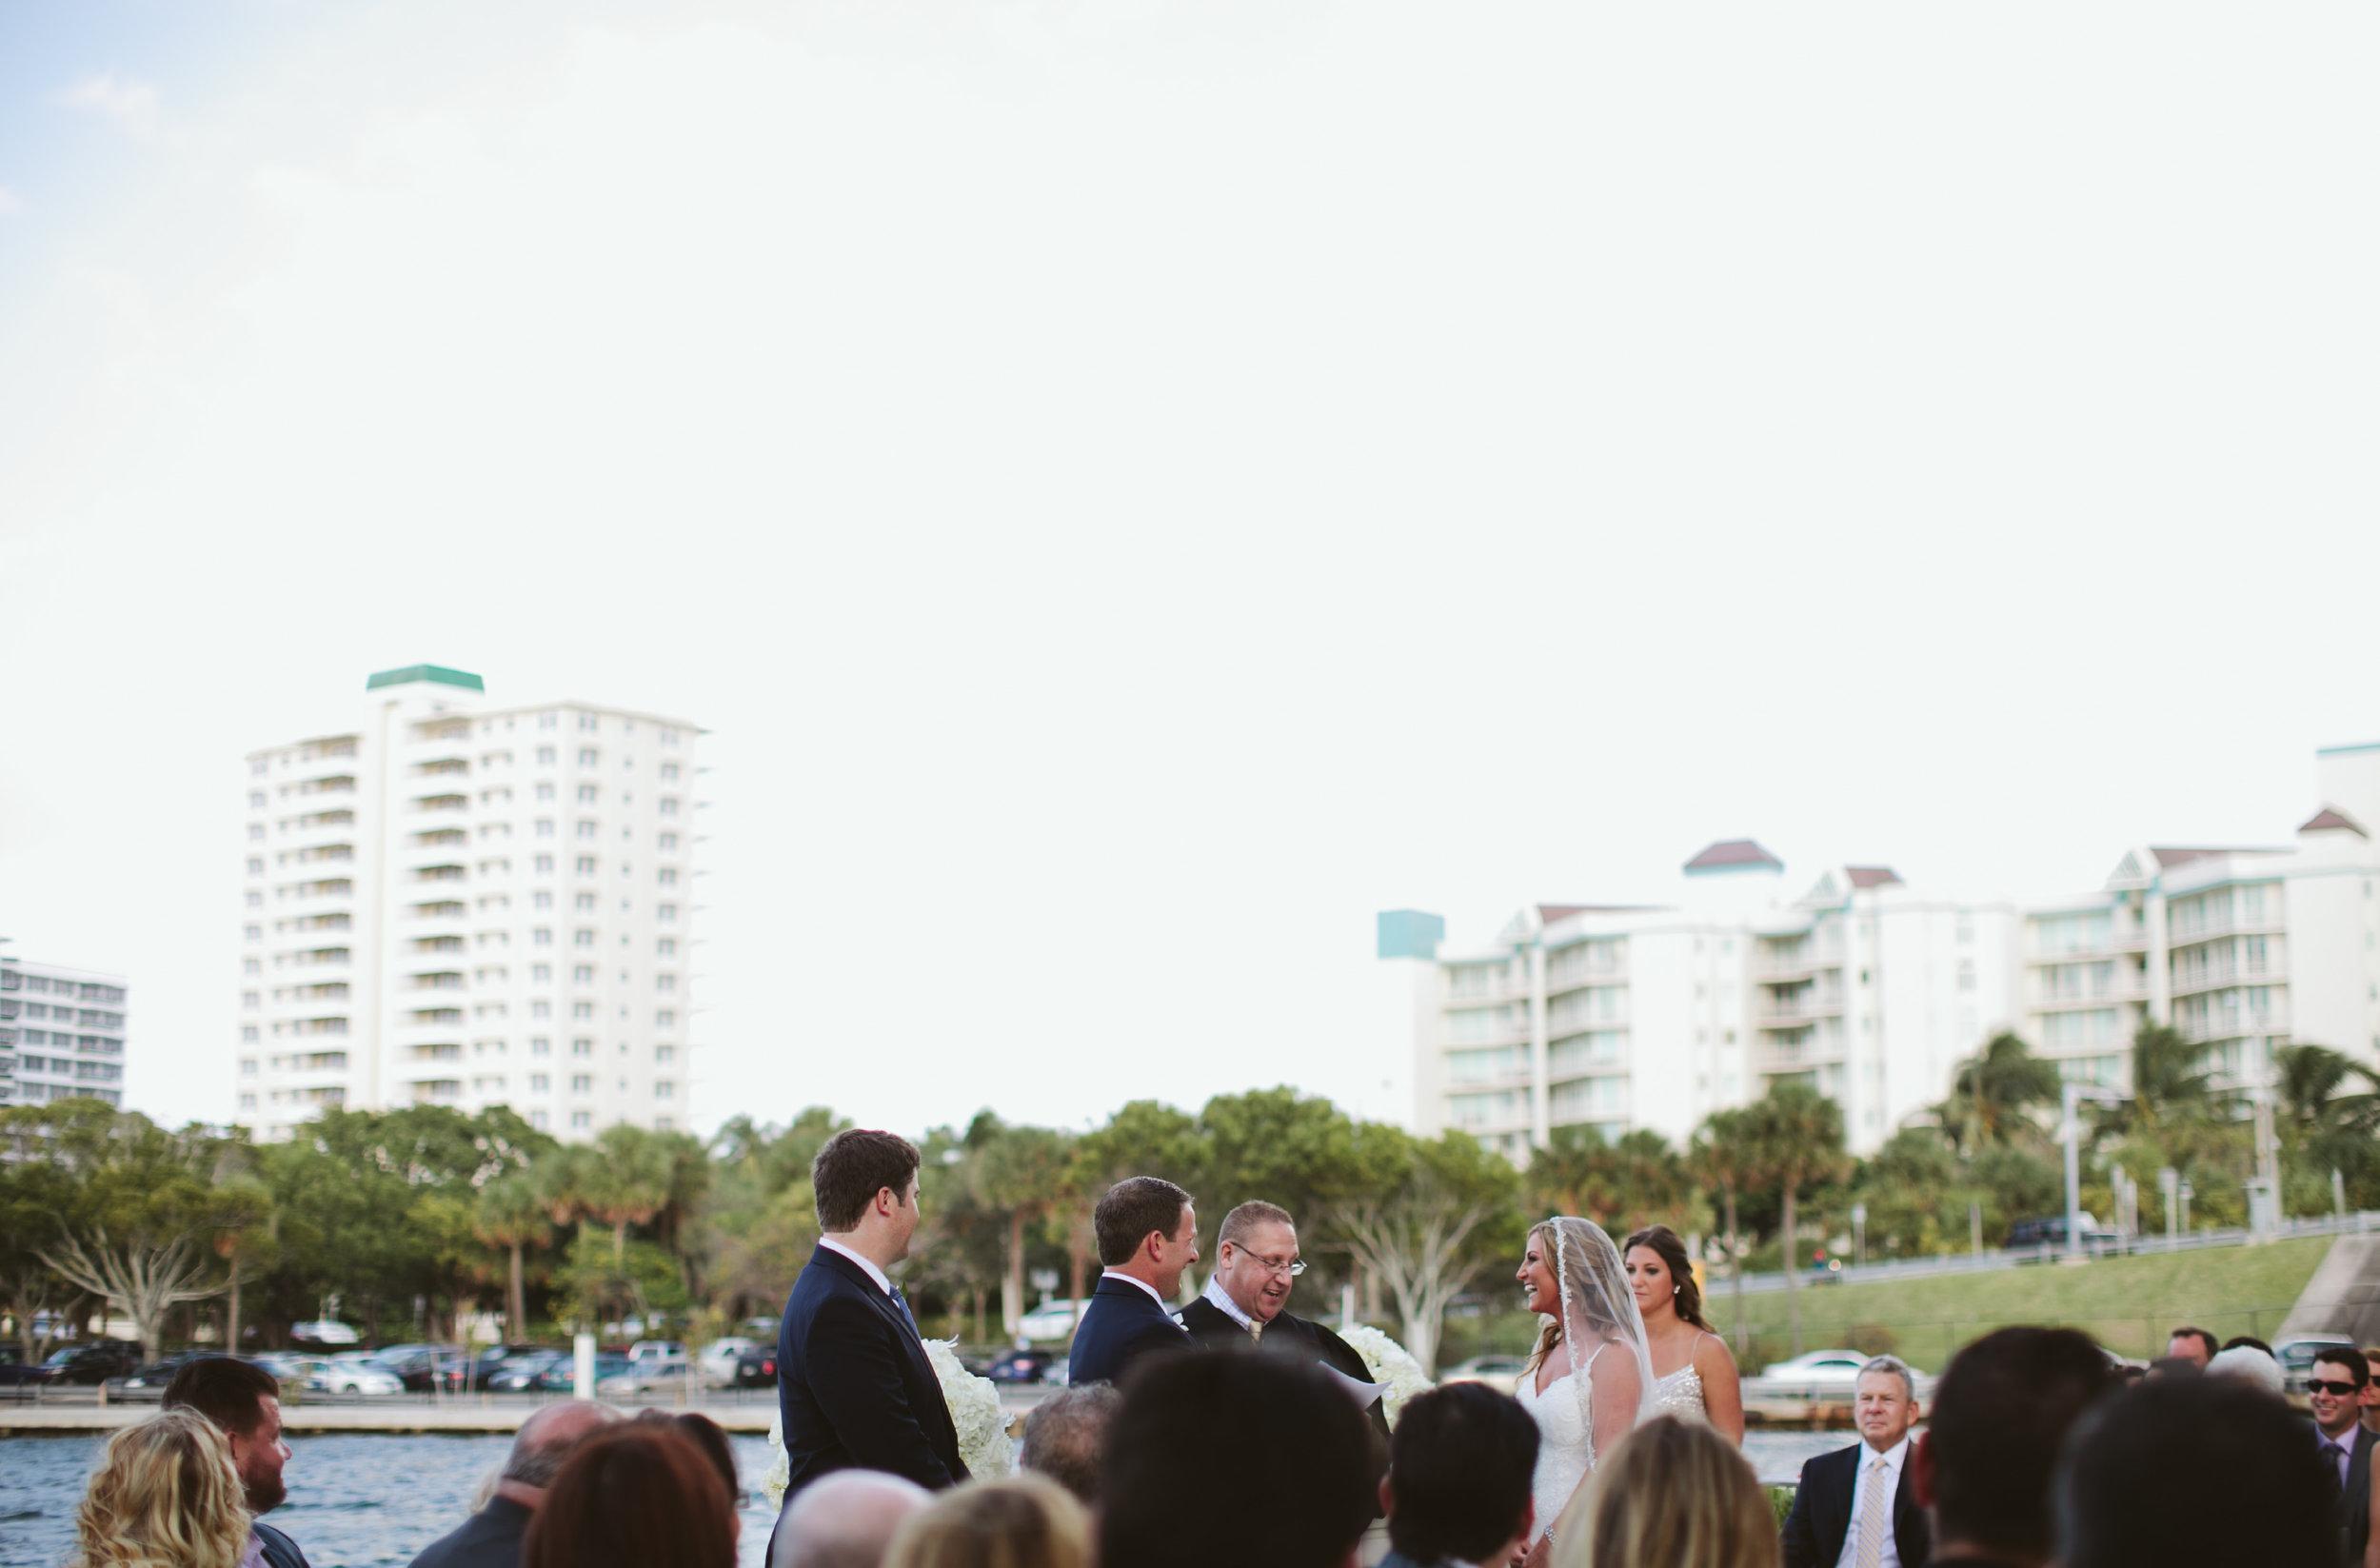 Kim + John's Wedding at the Waterstone Hotel in Boca Raton51.jpg